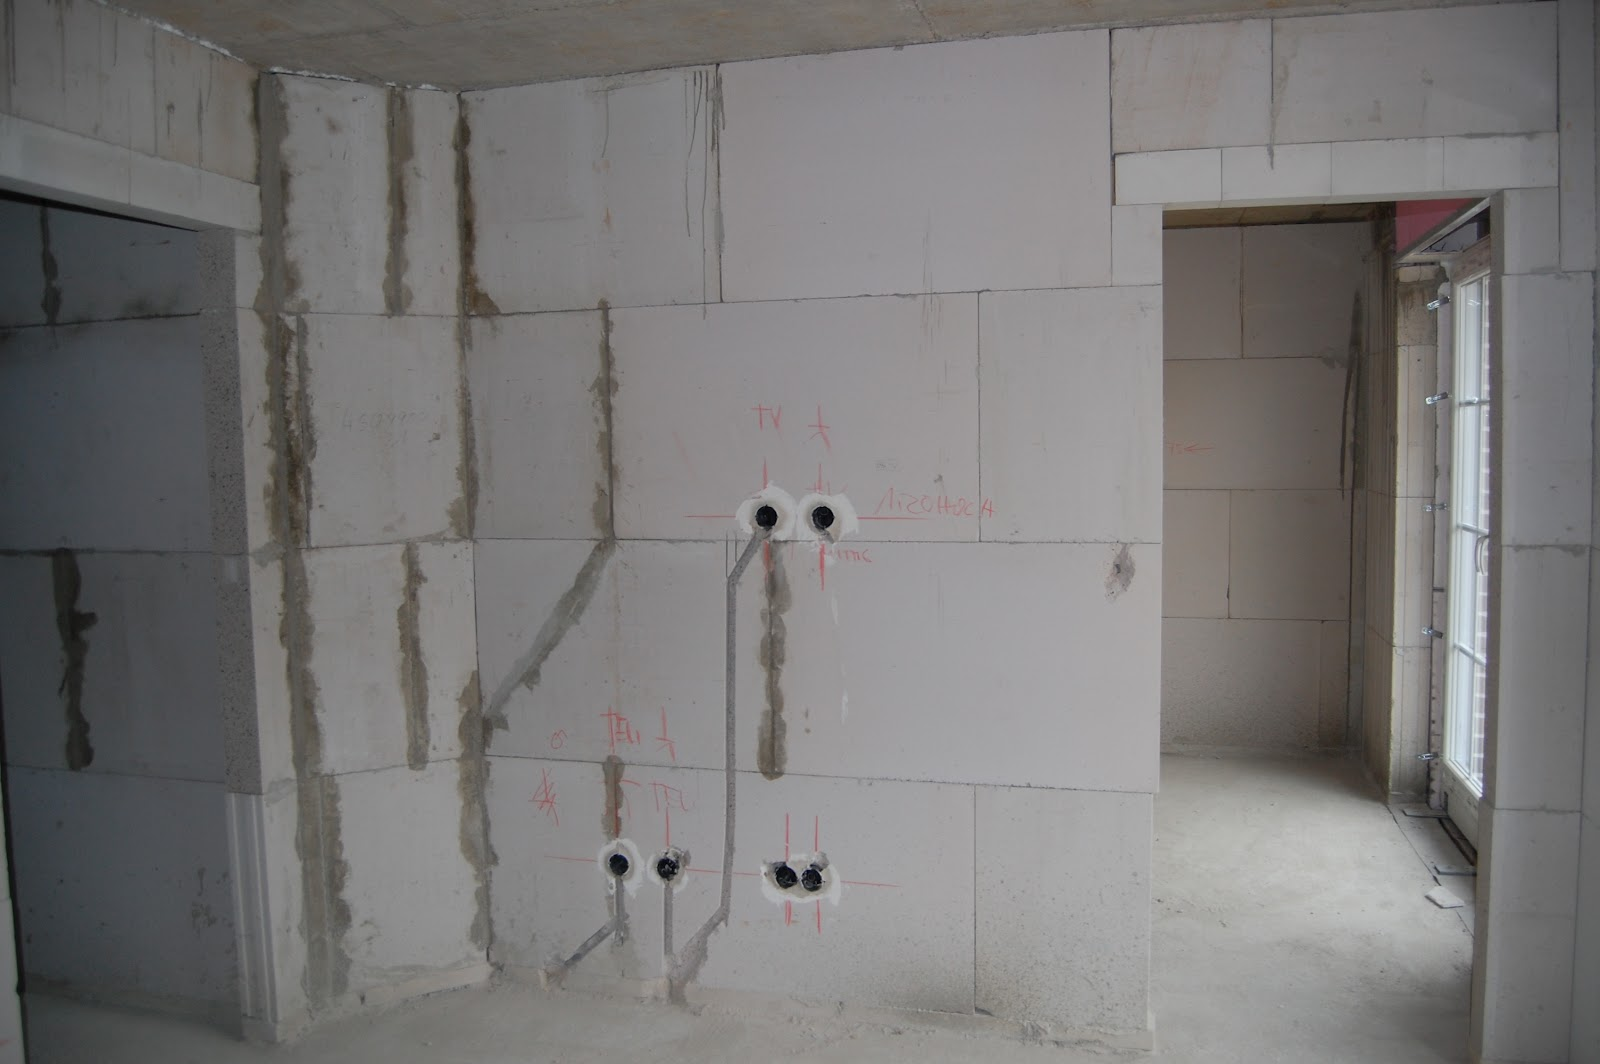 my home is my castle elektriker schlitze. Black Bedroom Furniture Sets. Home Design Ideas